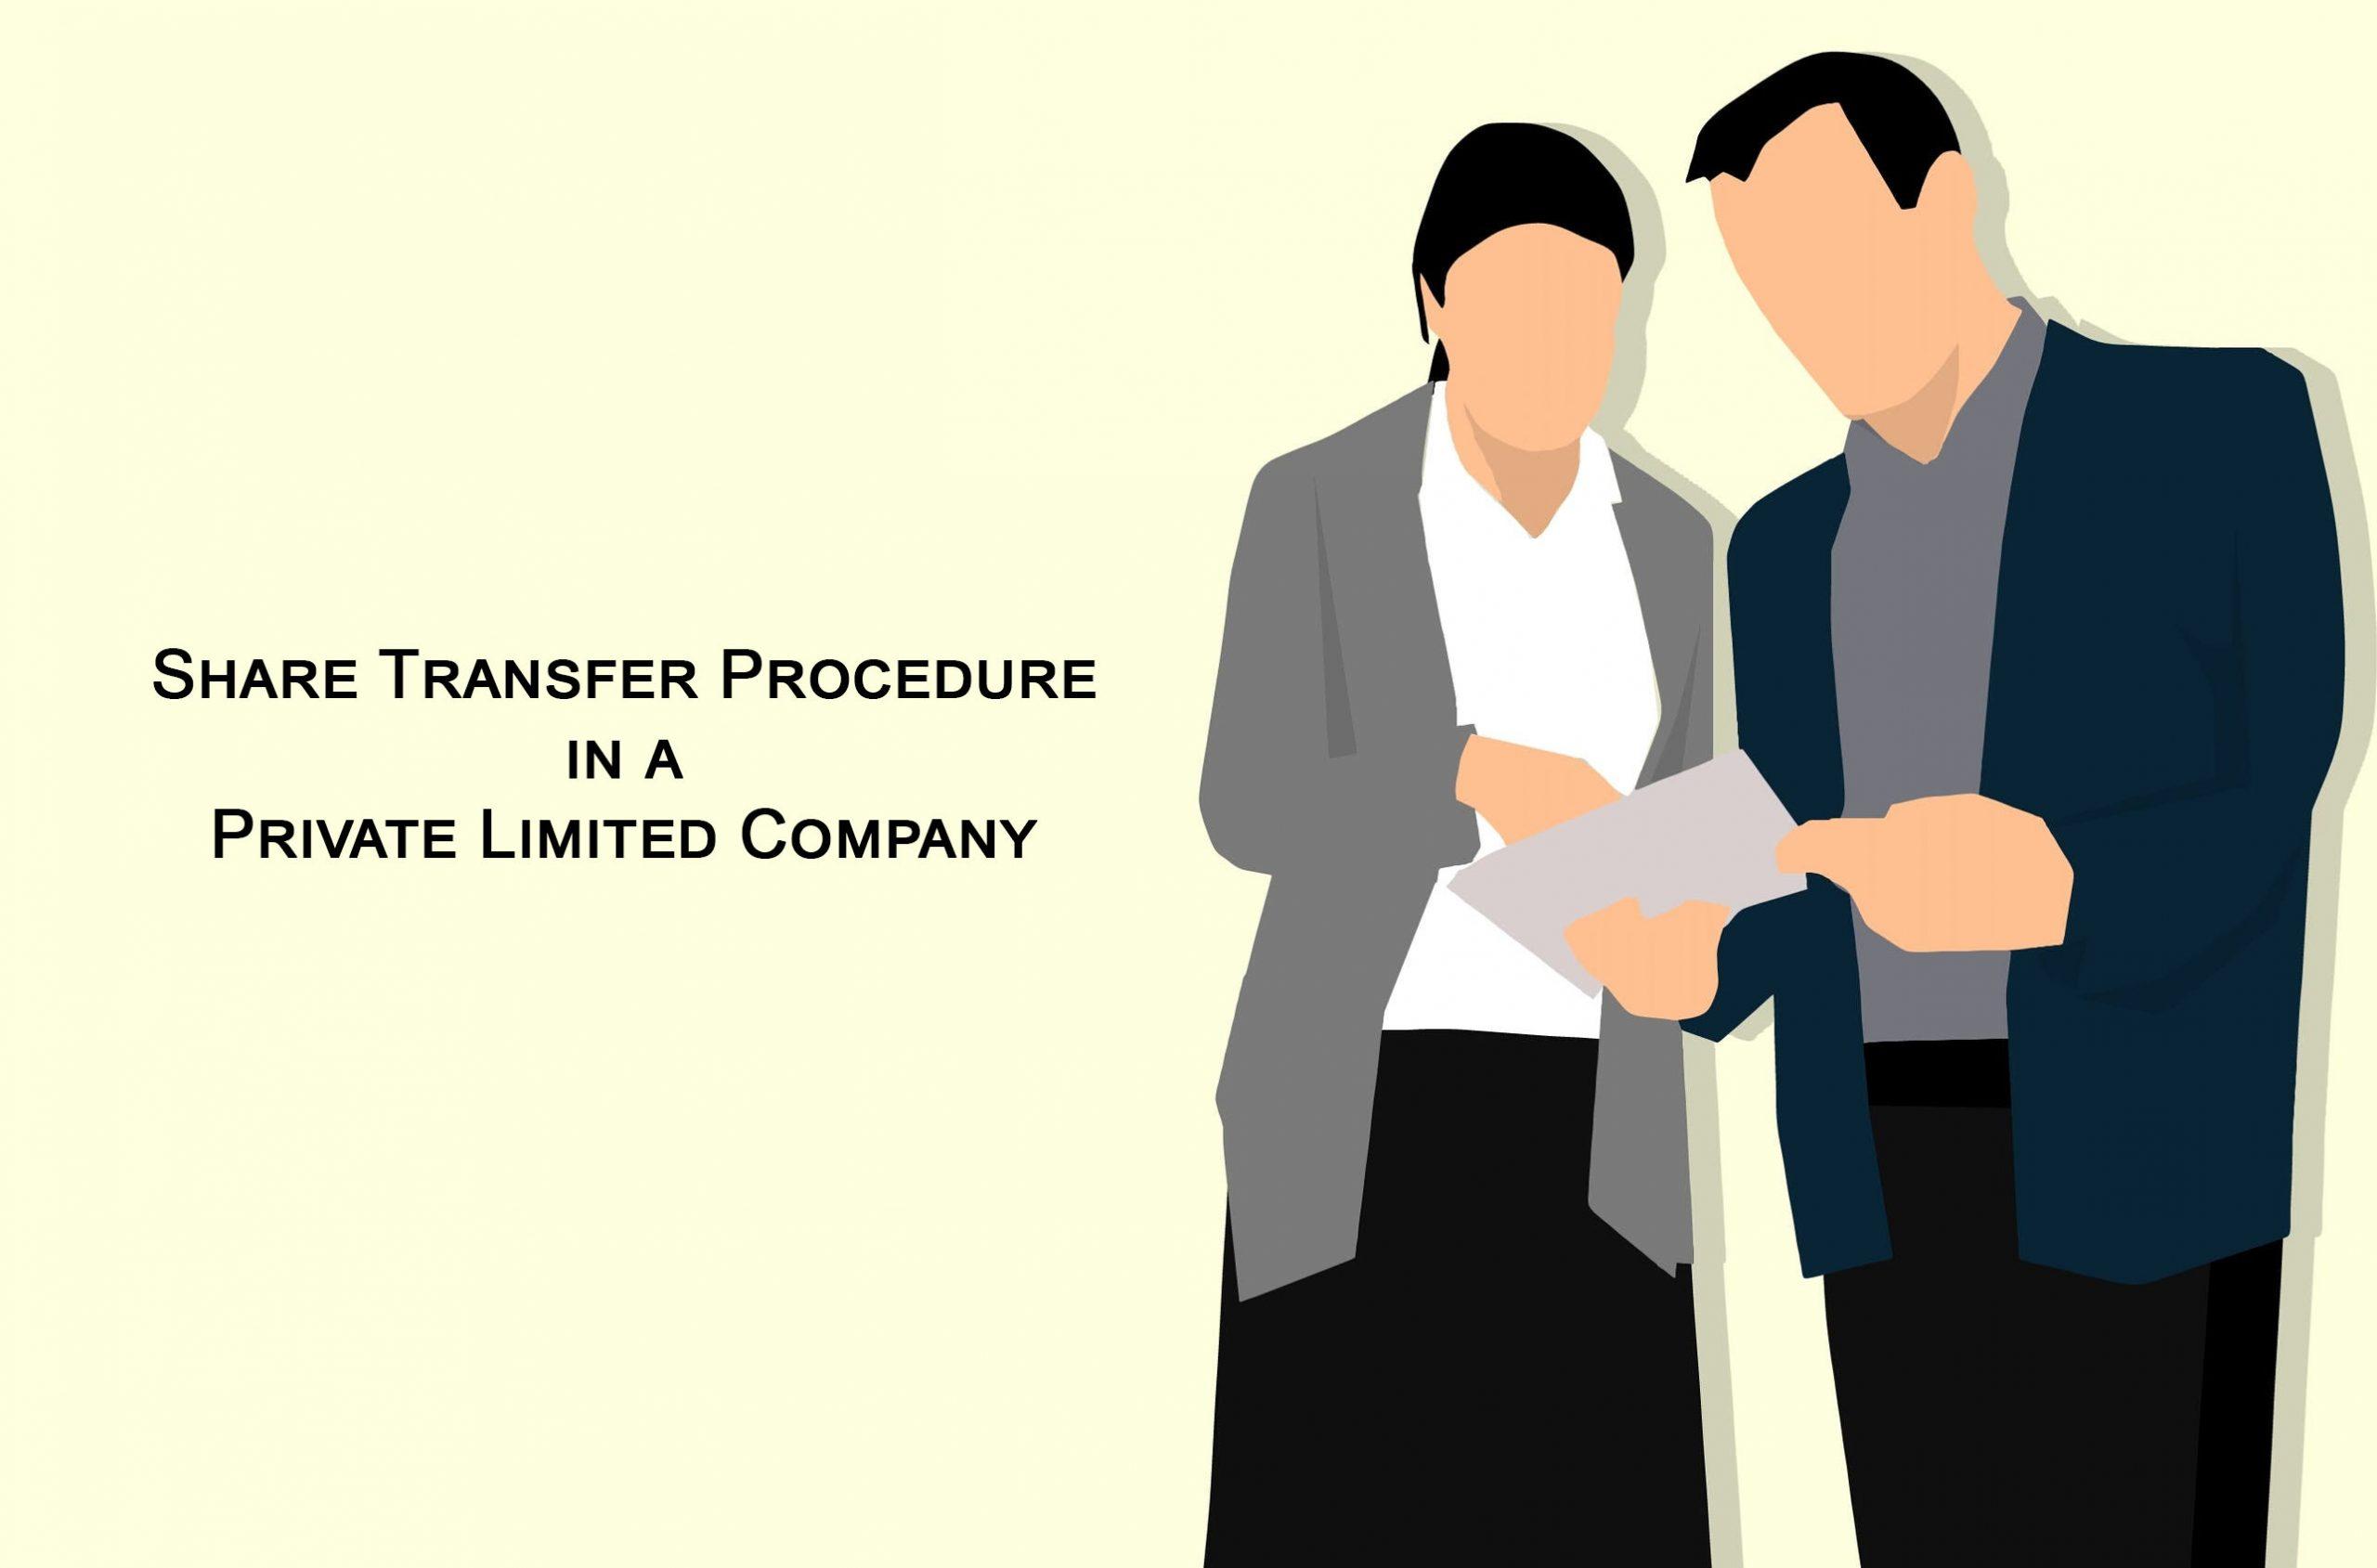 share transfer procedure